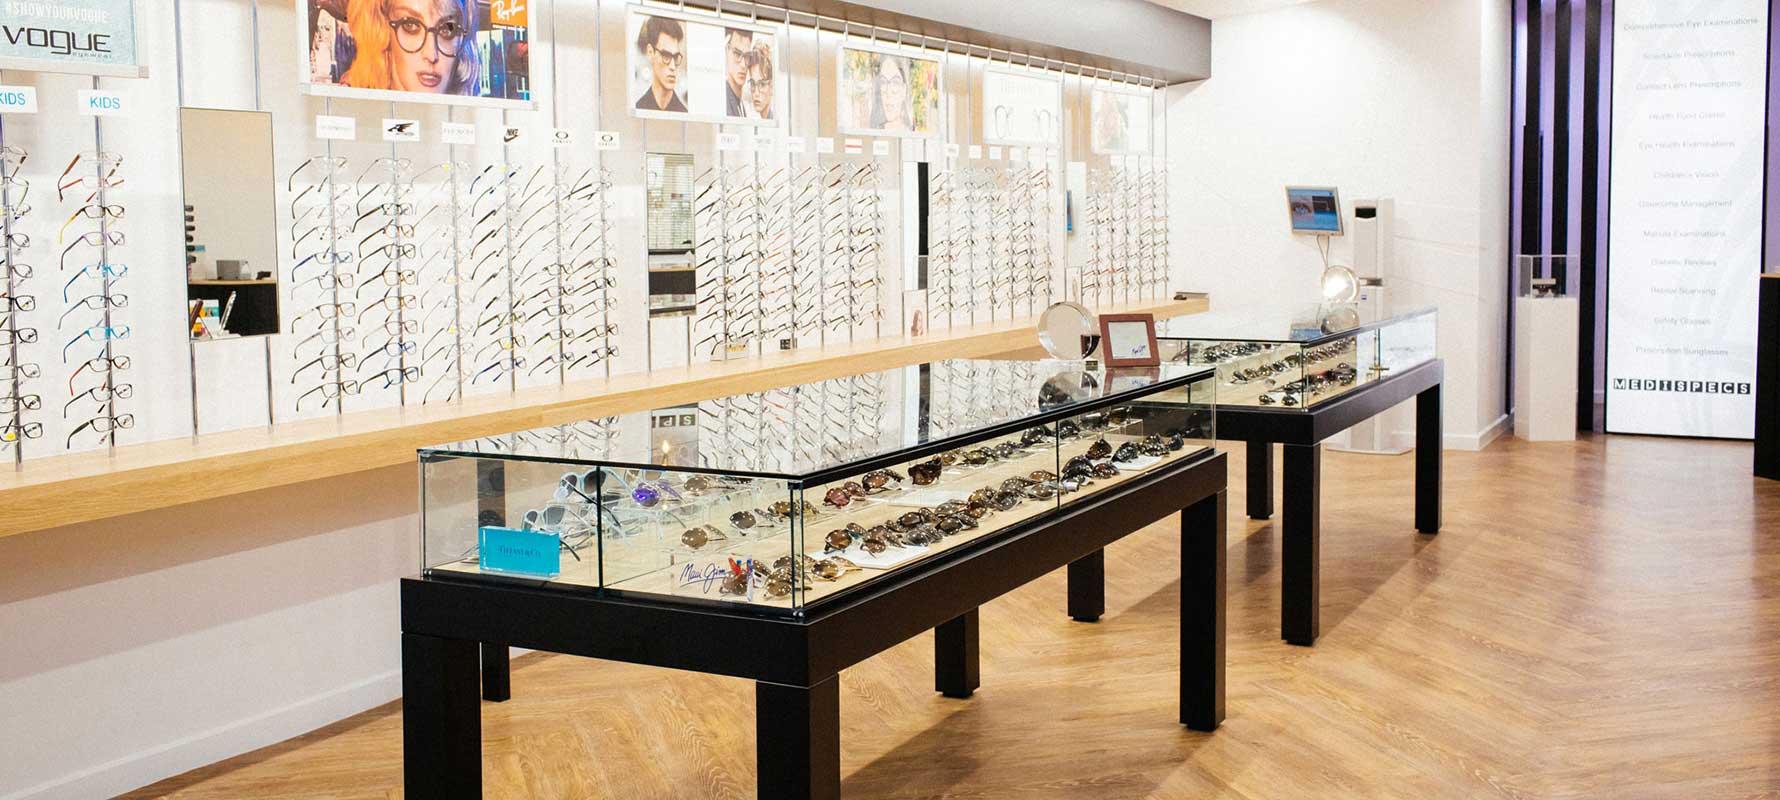 c0c6776336 Medispecs Optical Optometrists Robina Town Ctr Gold Coast